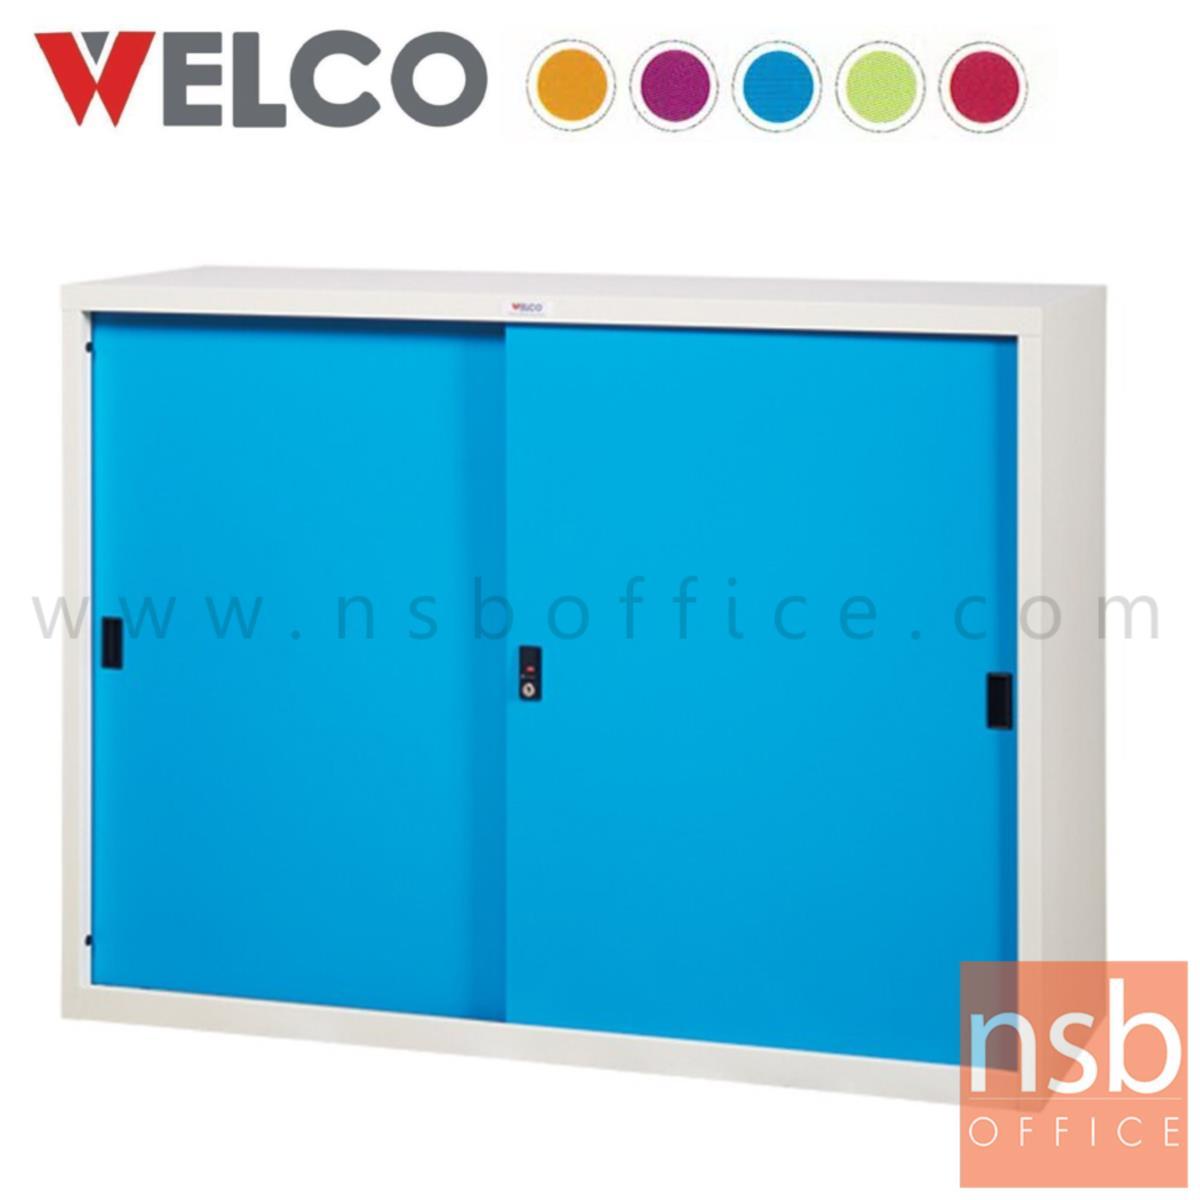 E30A001:ตู้เอกสารบานเลื่อนทึบเตี้ย 87.8H cm. ขนาด 3, 4 และ 5 ฟุต เวลโก(WELCO) รุ่น WSL